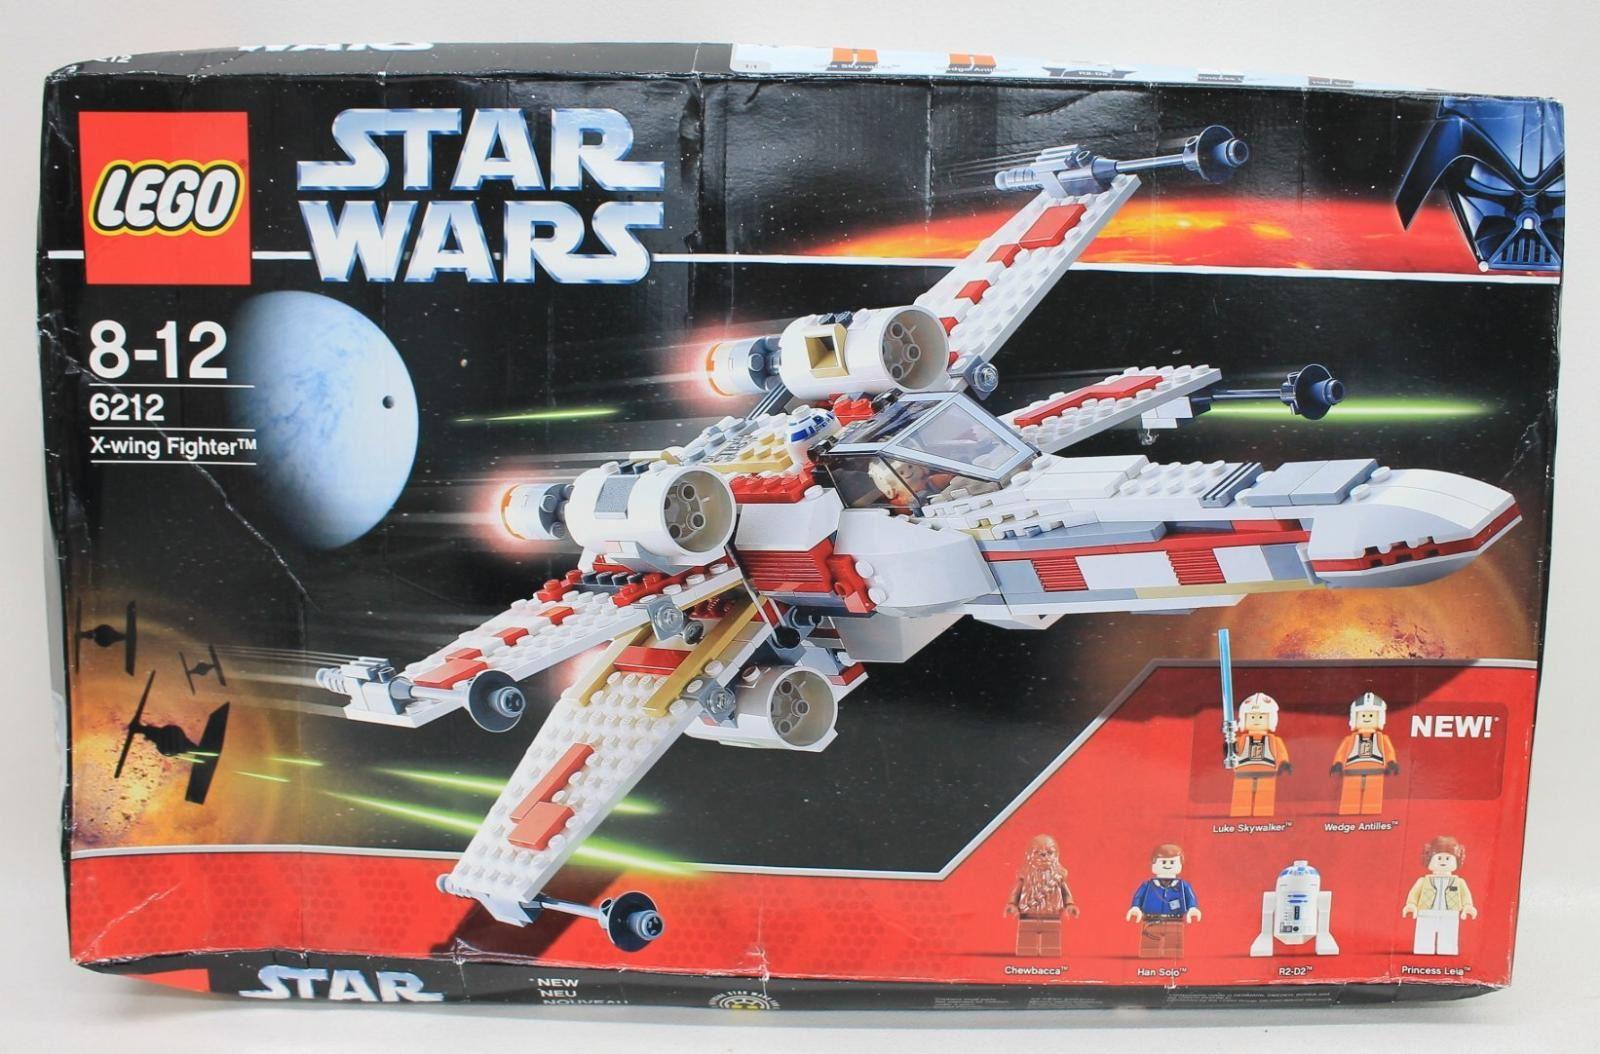 LEGO 6212 Star Wars X-Wing Fighter 2006 Brickset Building Block Set NEW